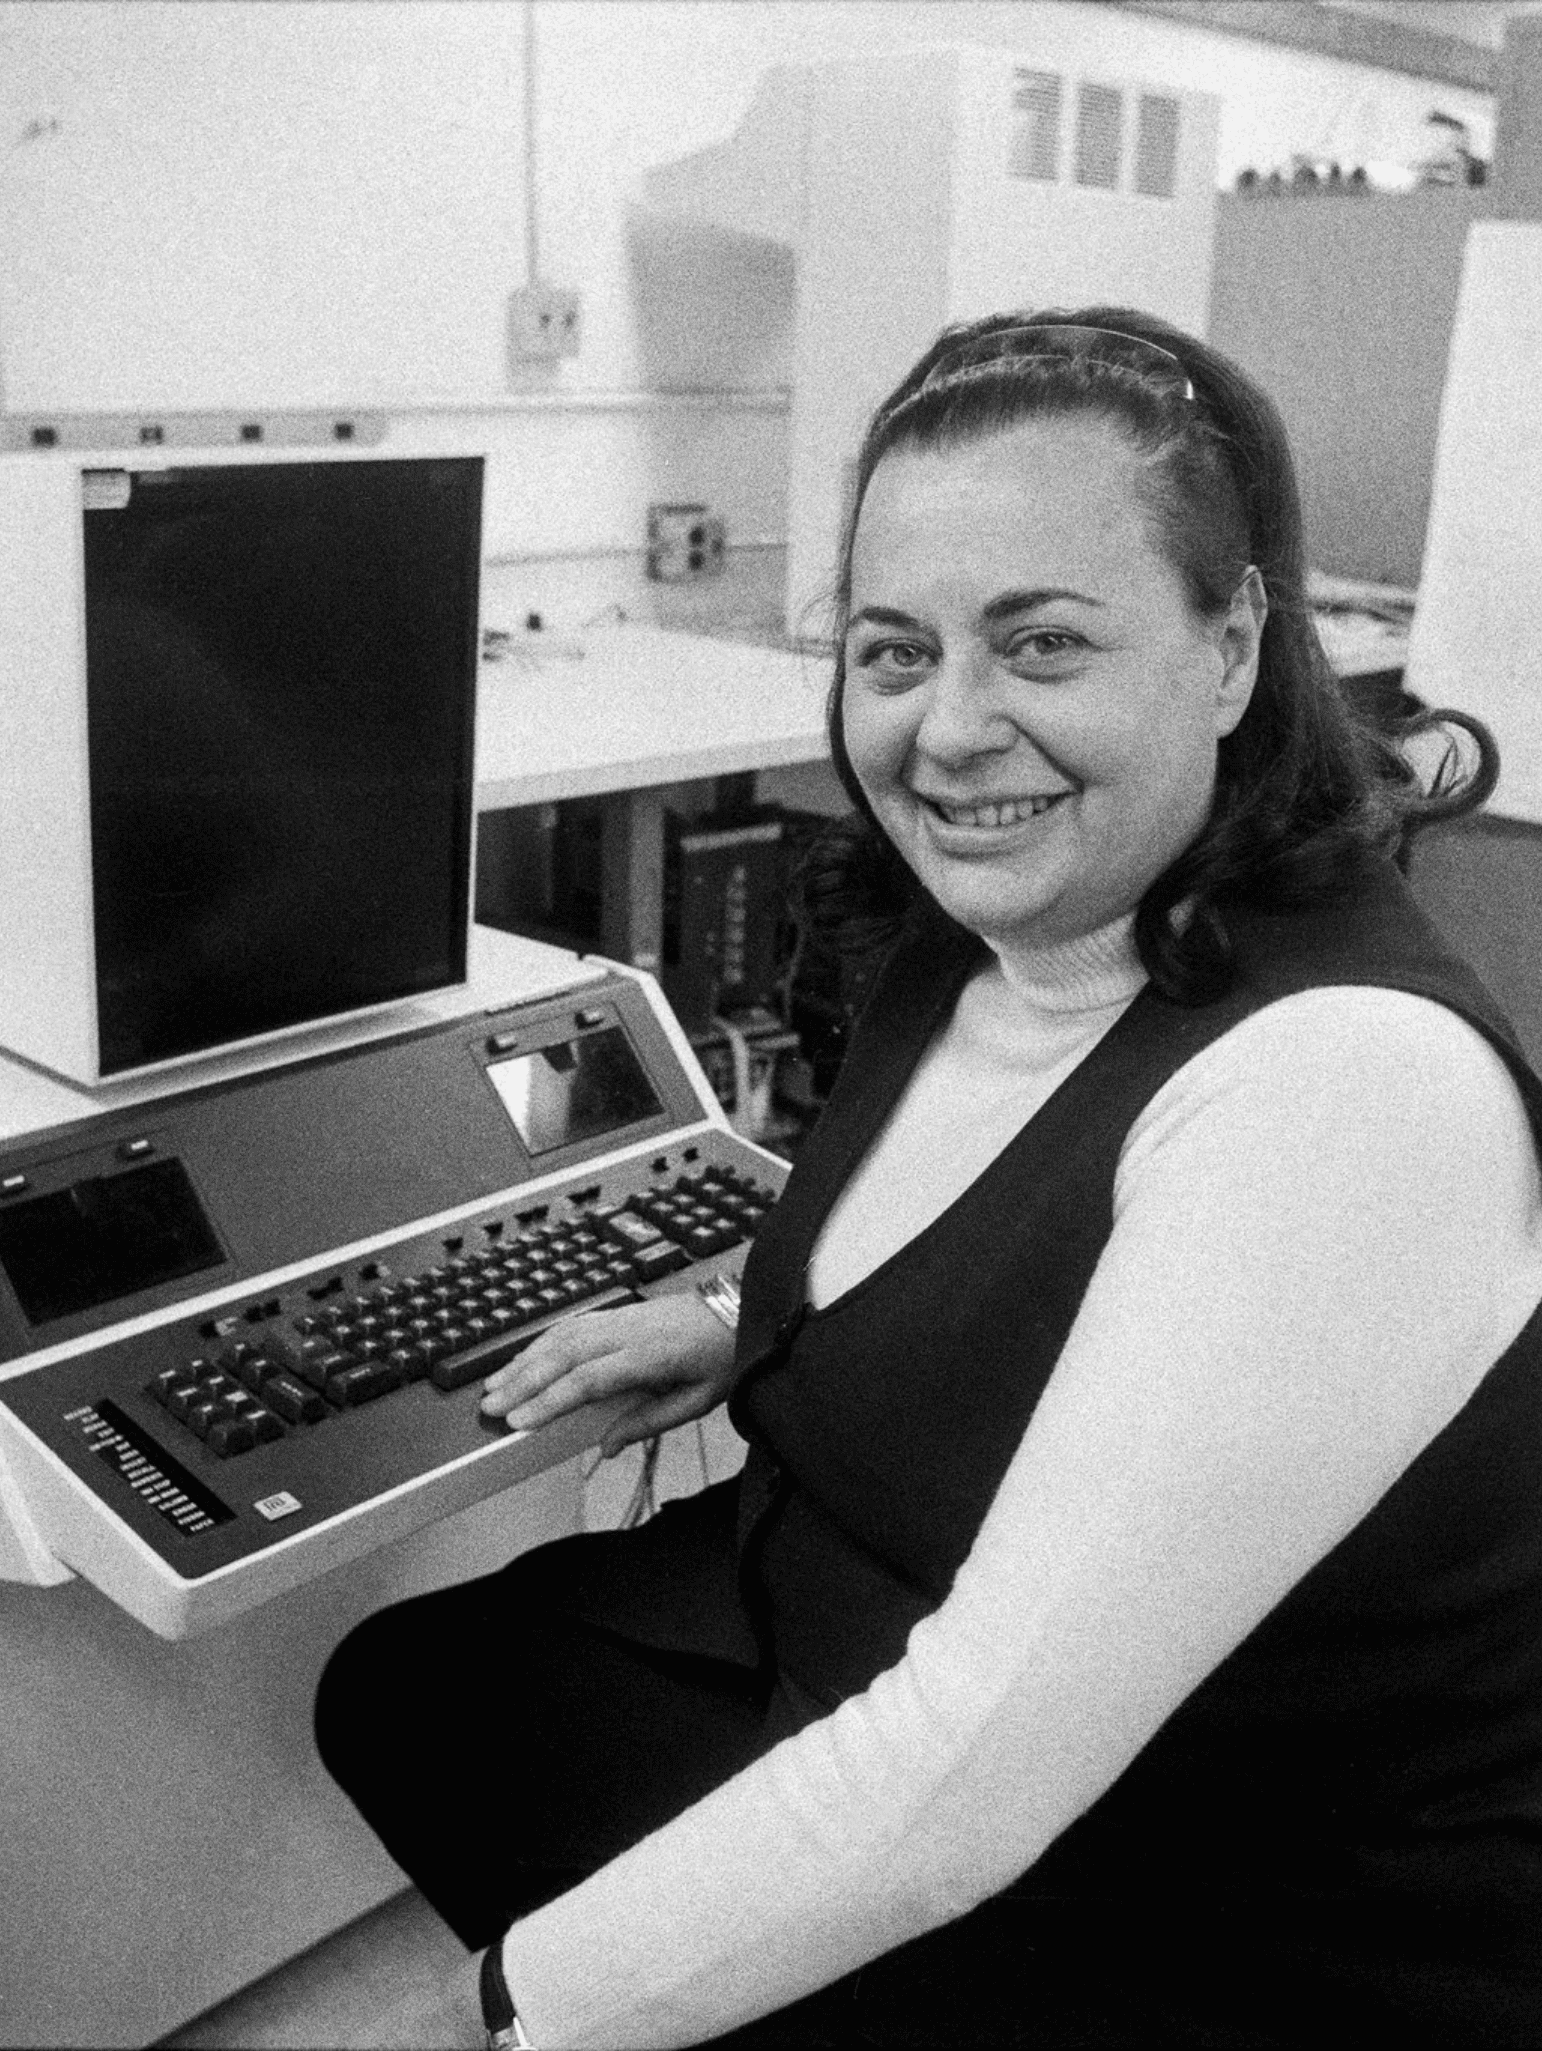 Evelyn Berezin - Mujeres informáticas